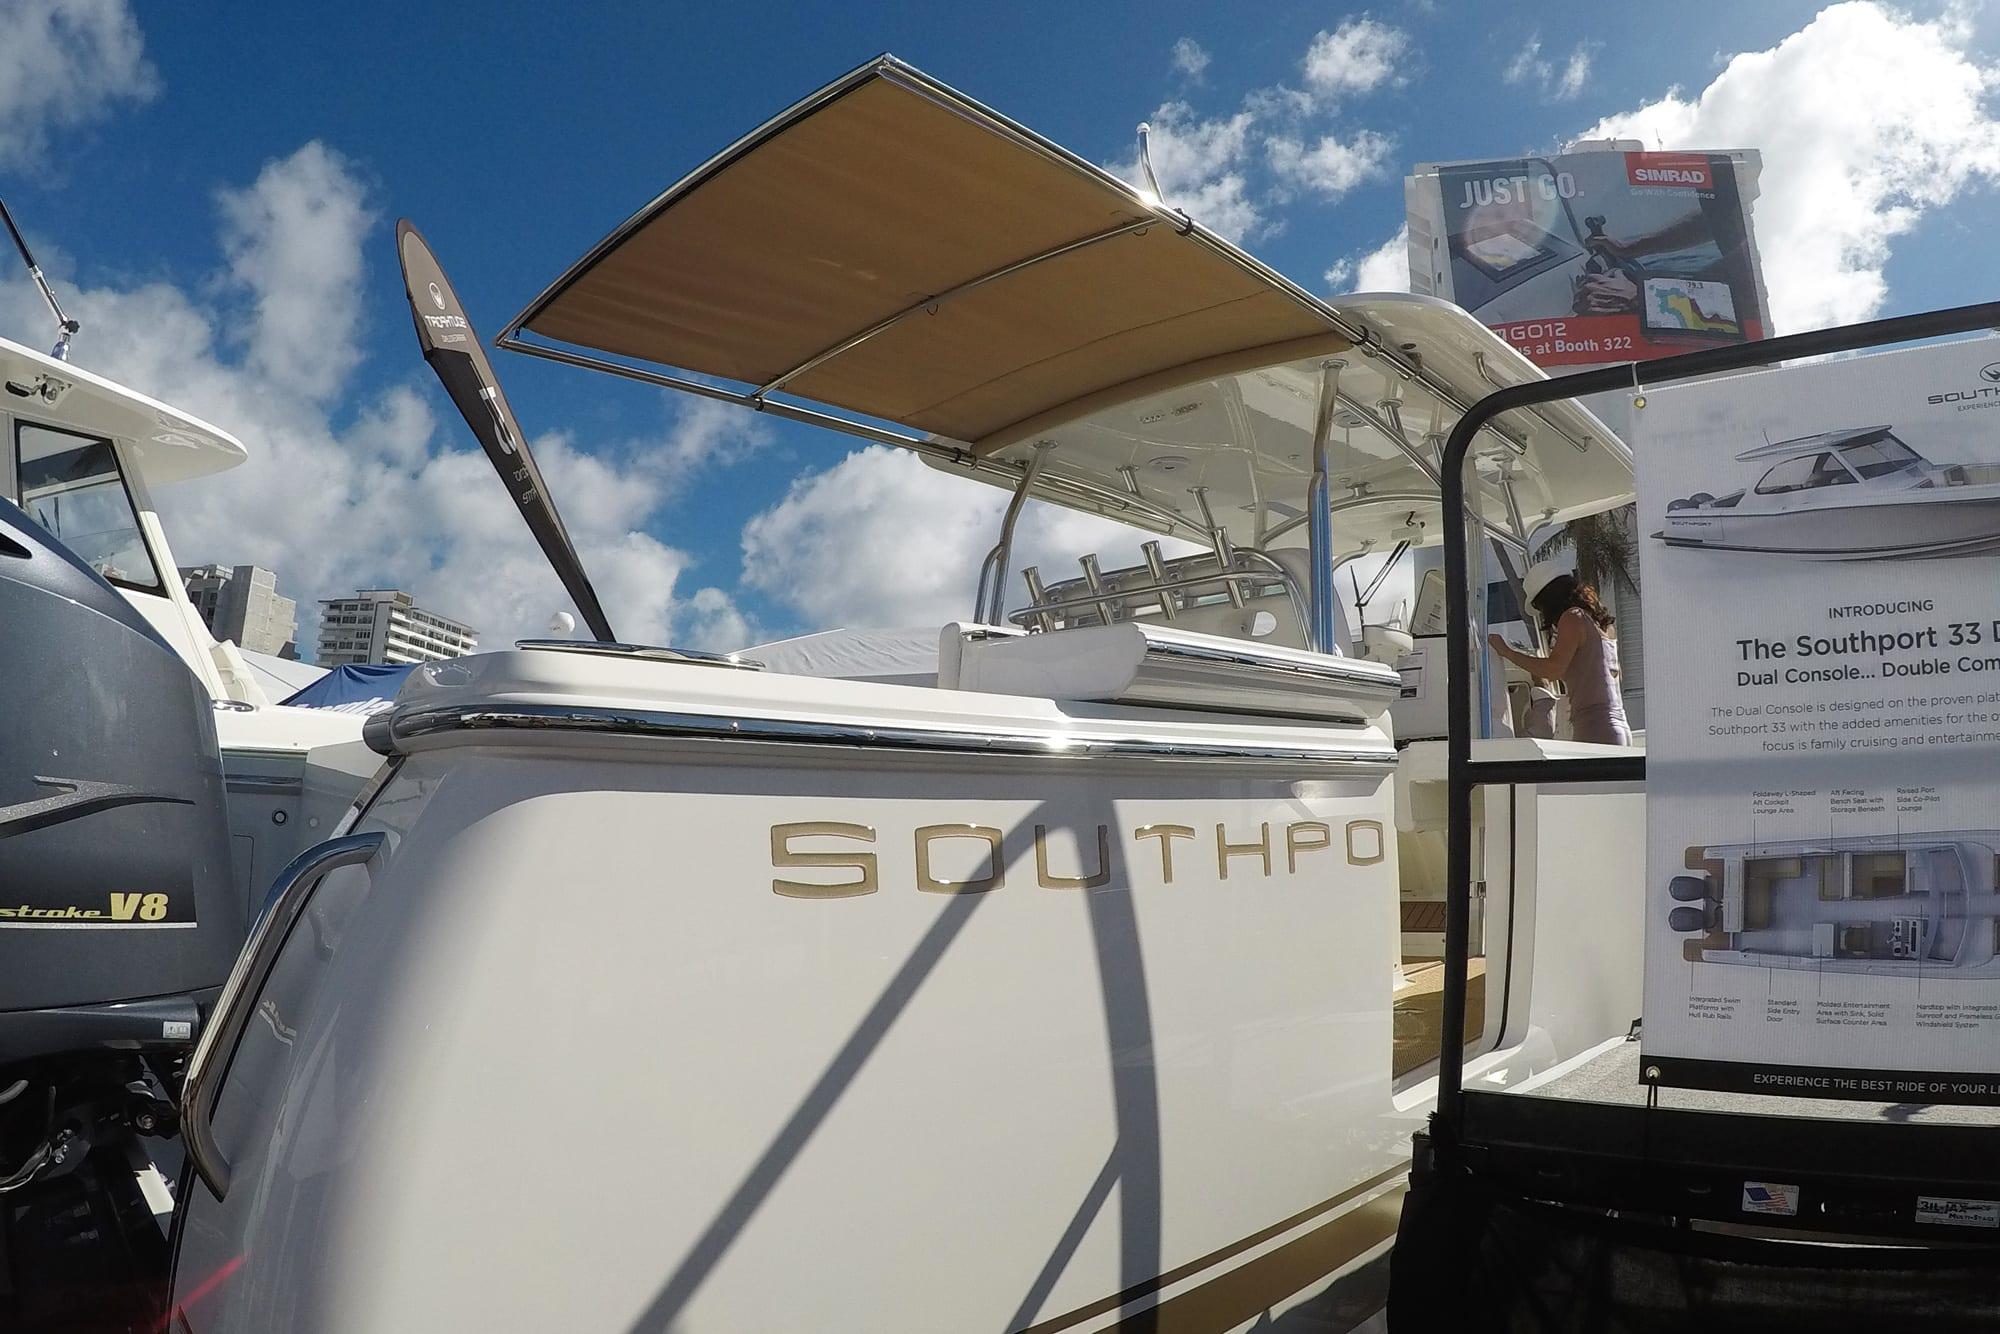 Southport boats